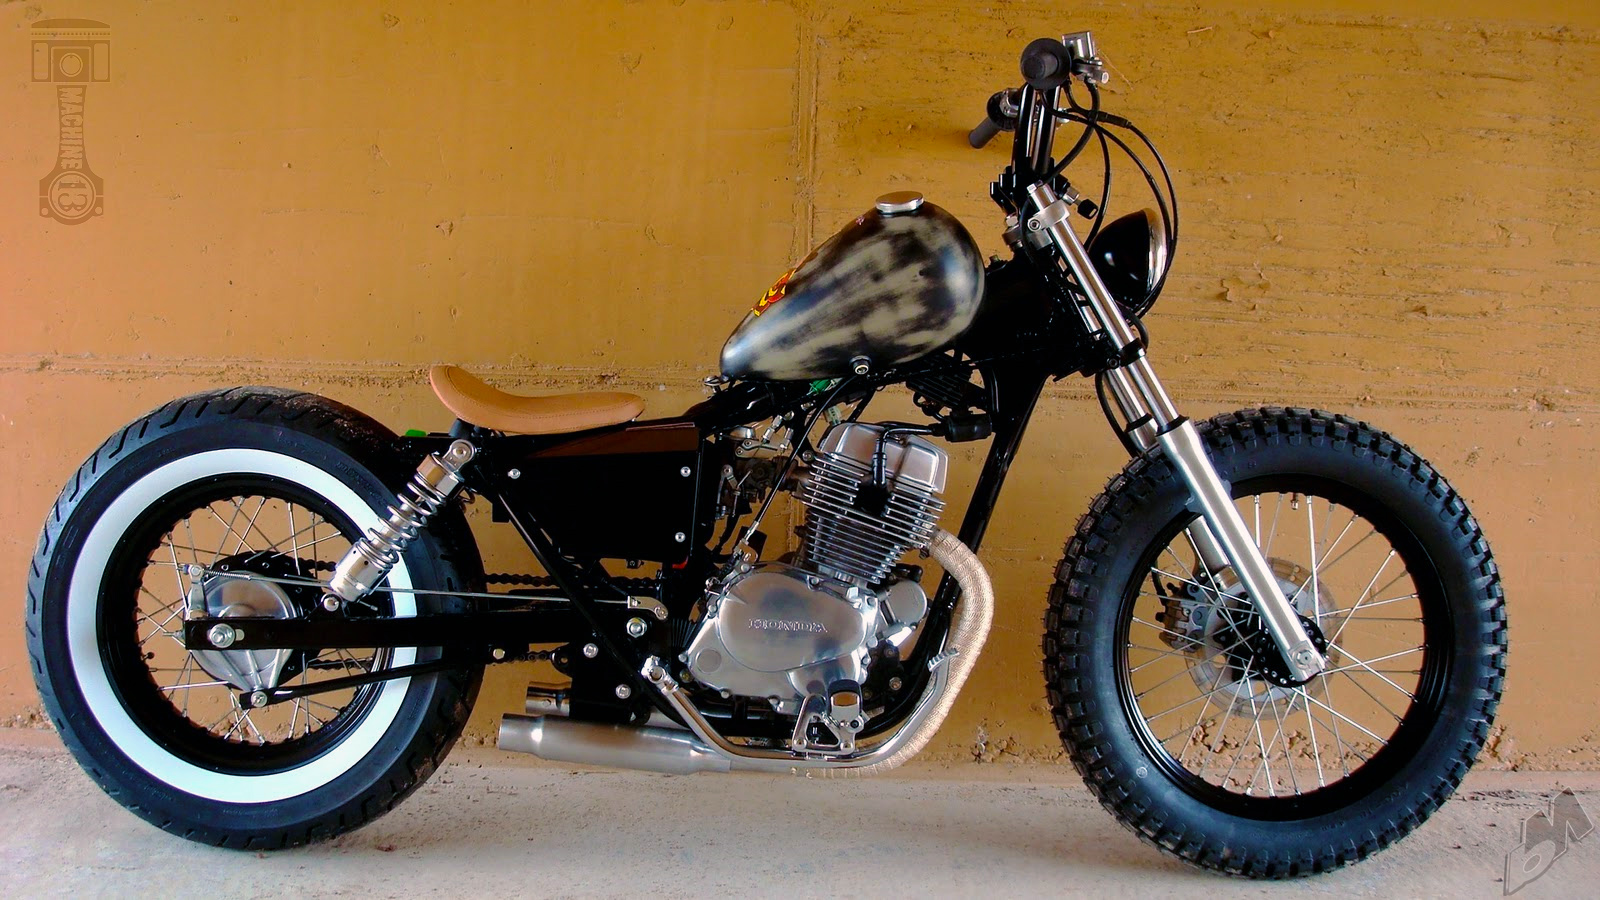 kyles honda rebel by machine13 bikermetric